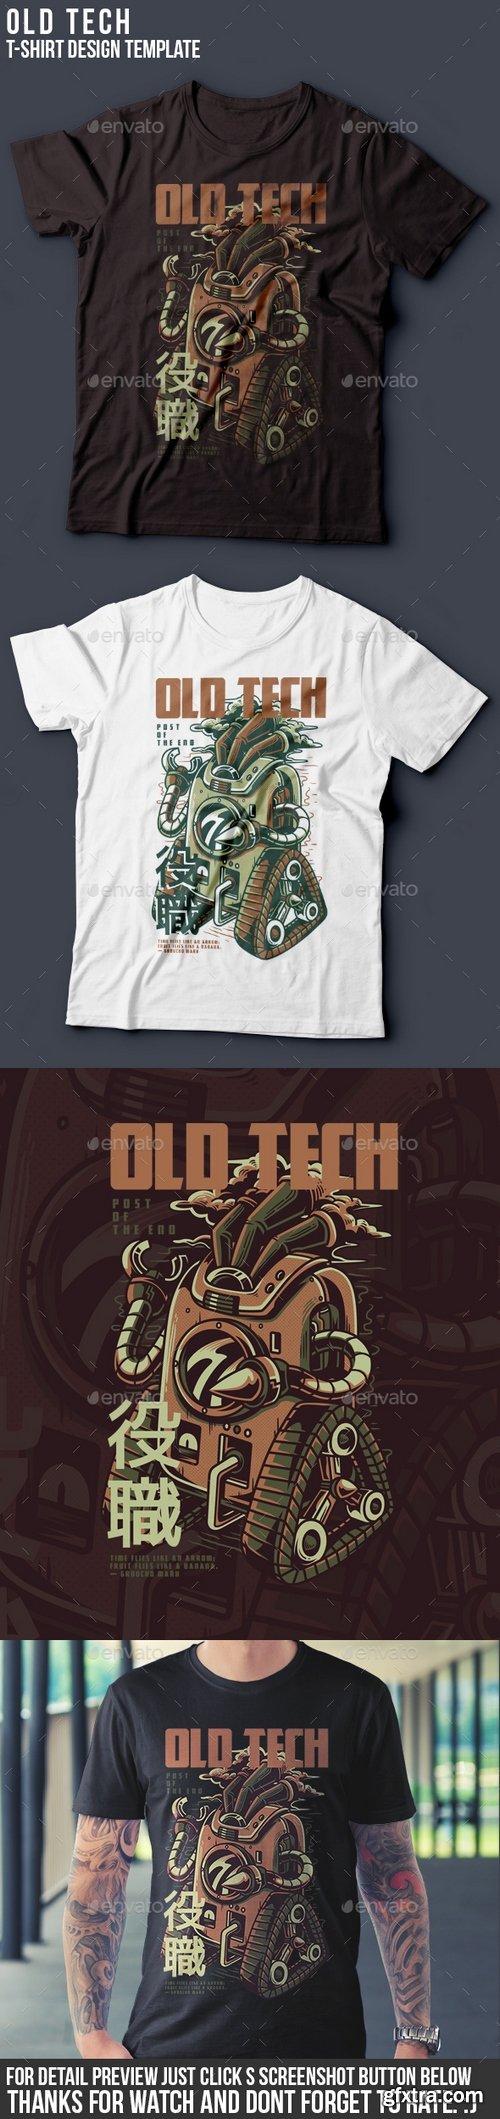 Graphicriver - Old Tech T-Shirt Design 22061835